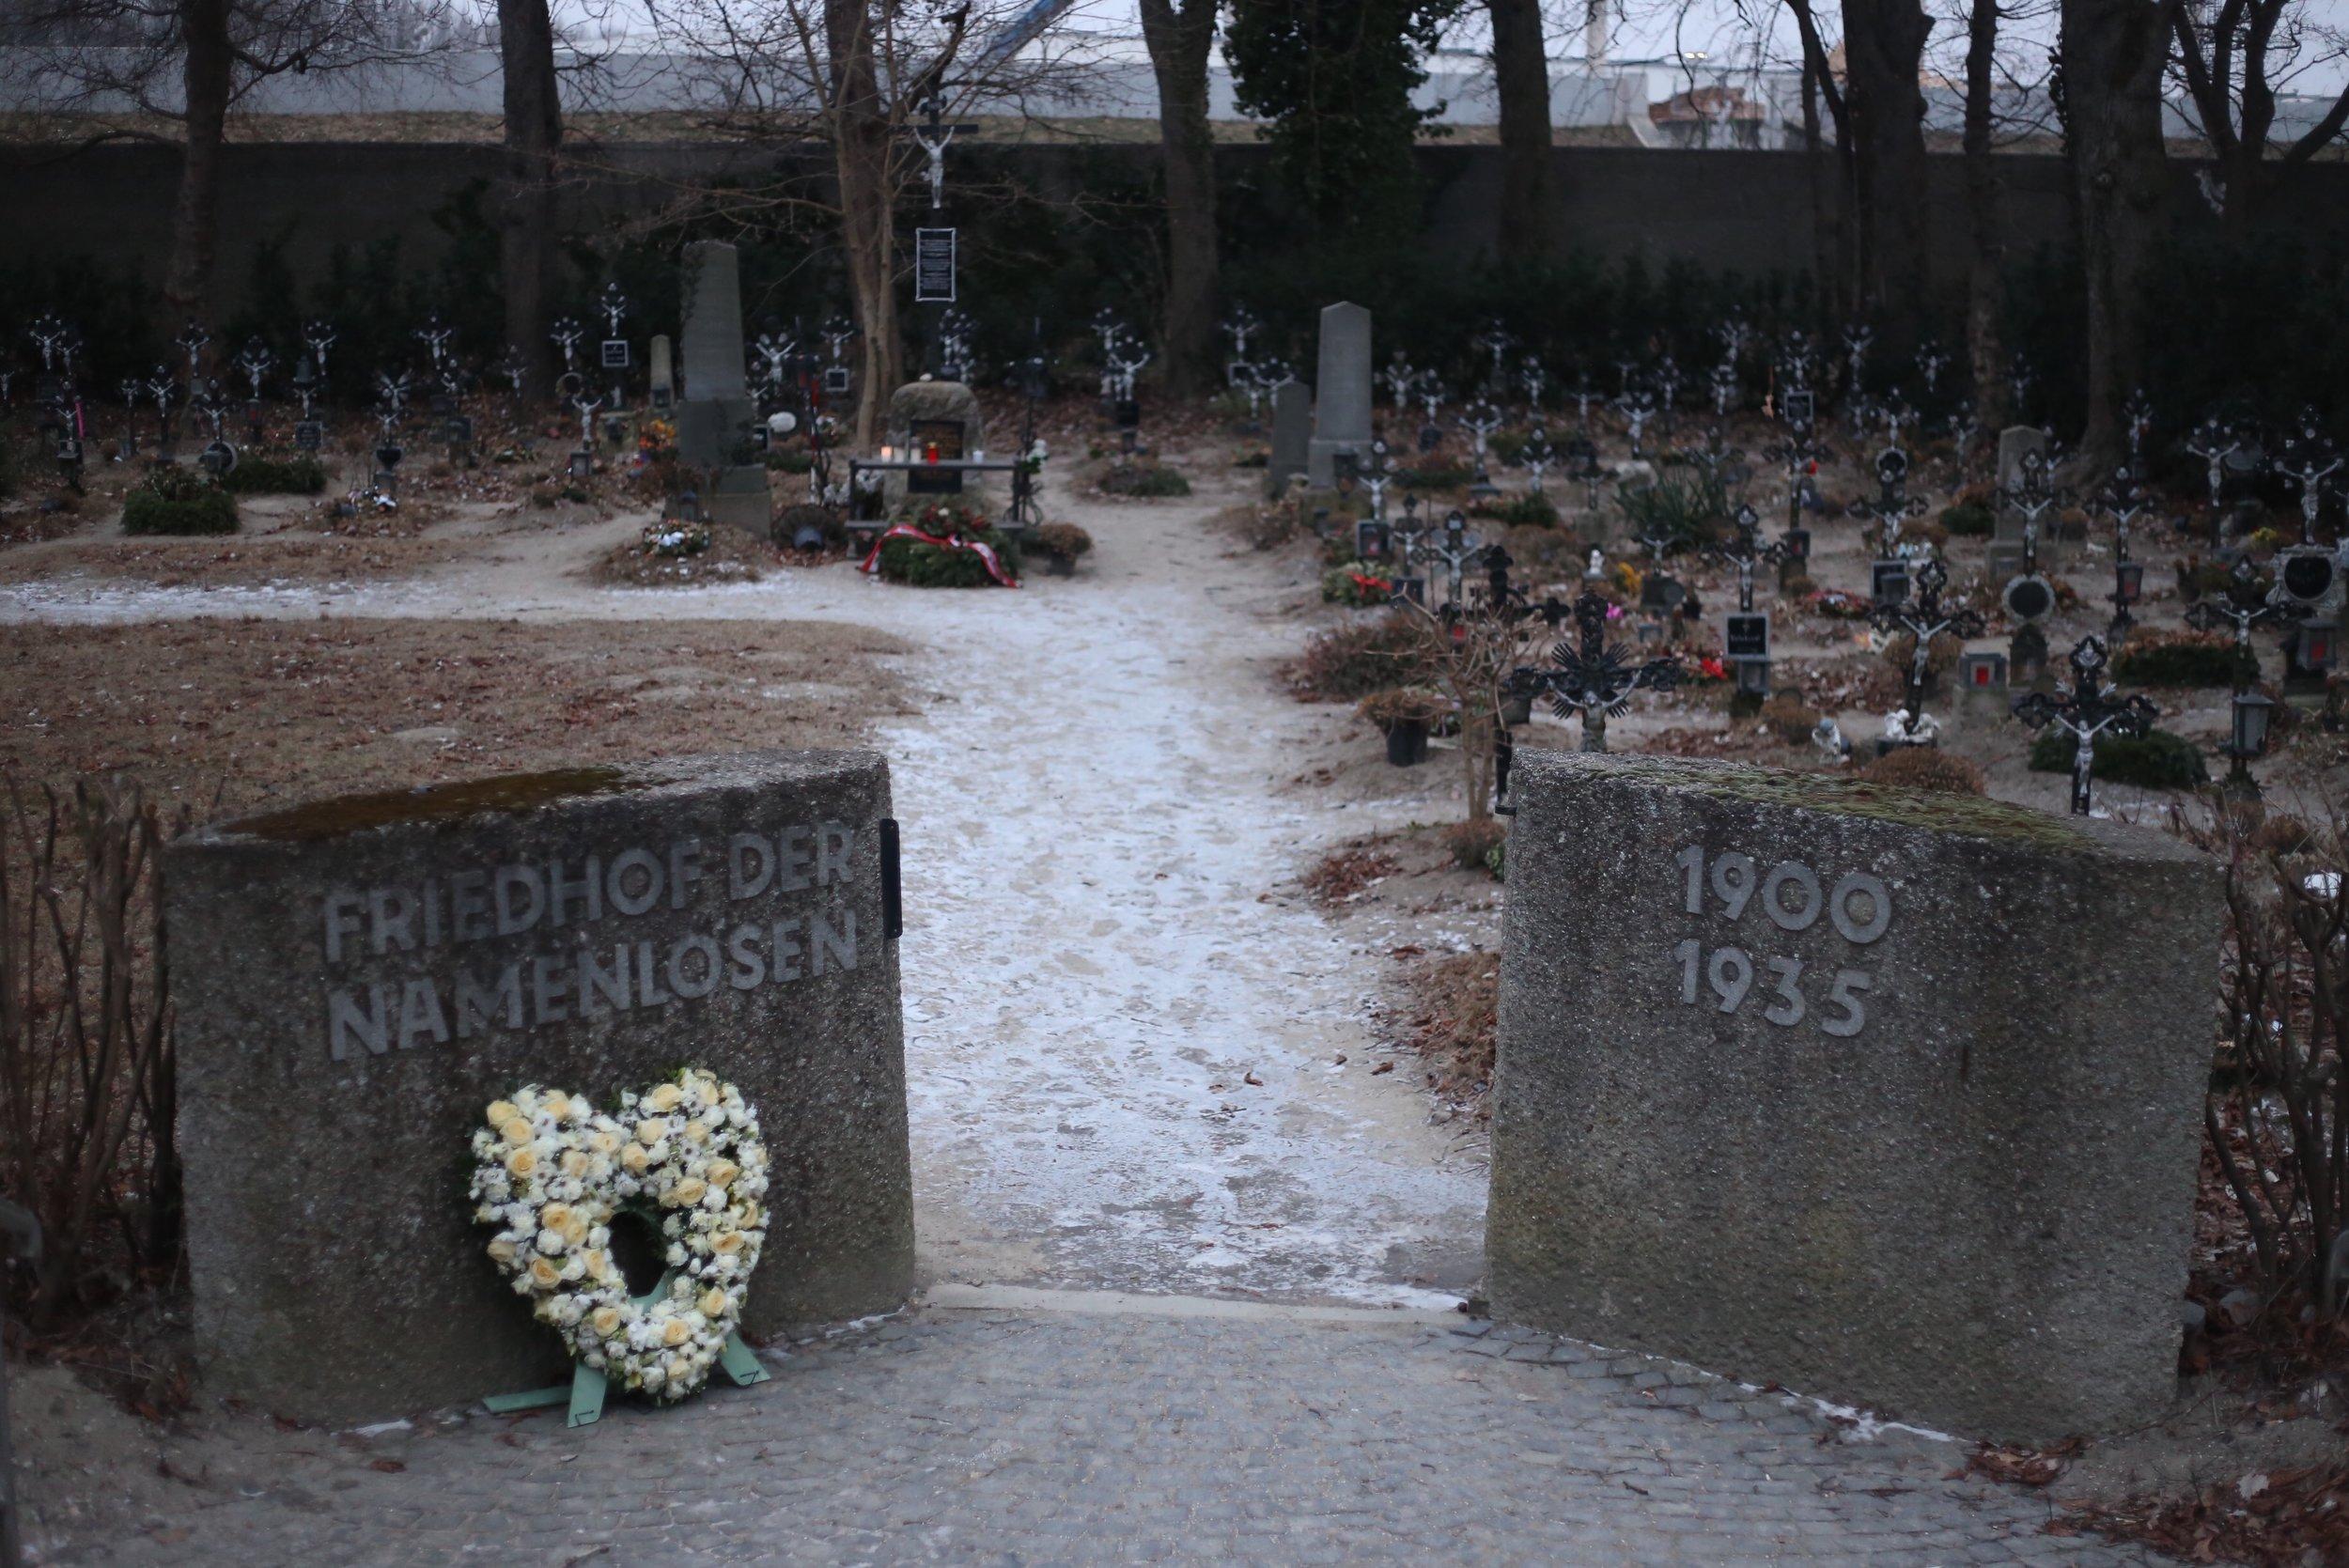 Friedhof Namenlosen cemetery Vienna.